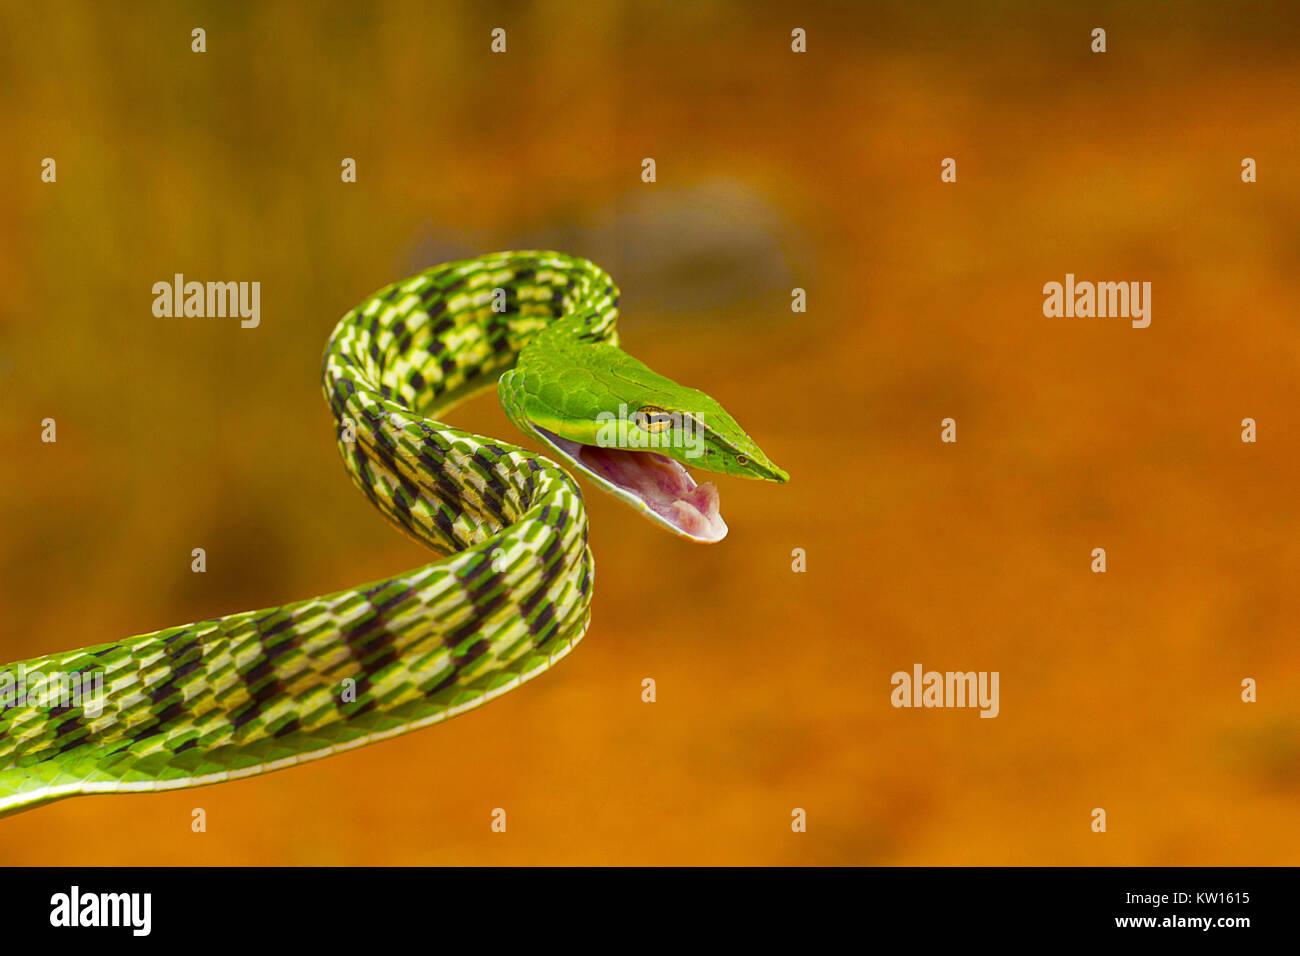 Vid verde serpiente, Ahaetulla nasuta, leve venenosos. Pondicherry, Tamil Nadu, India Foto de stock